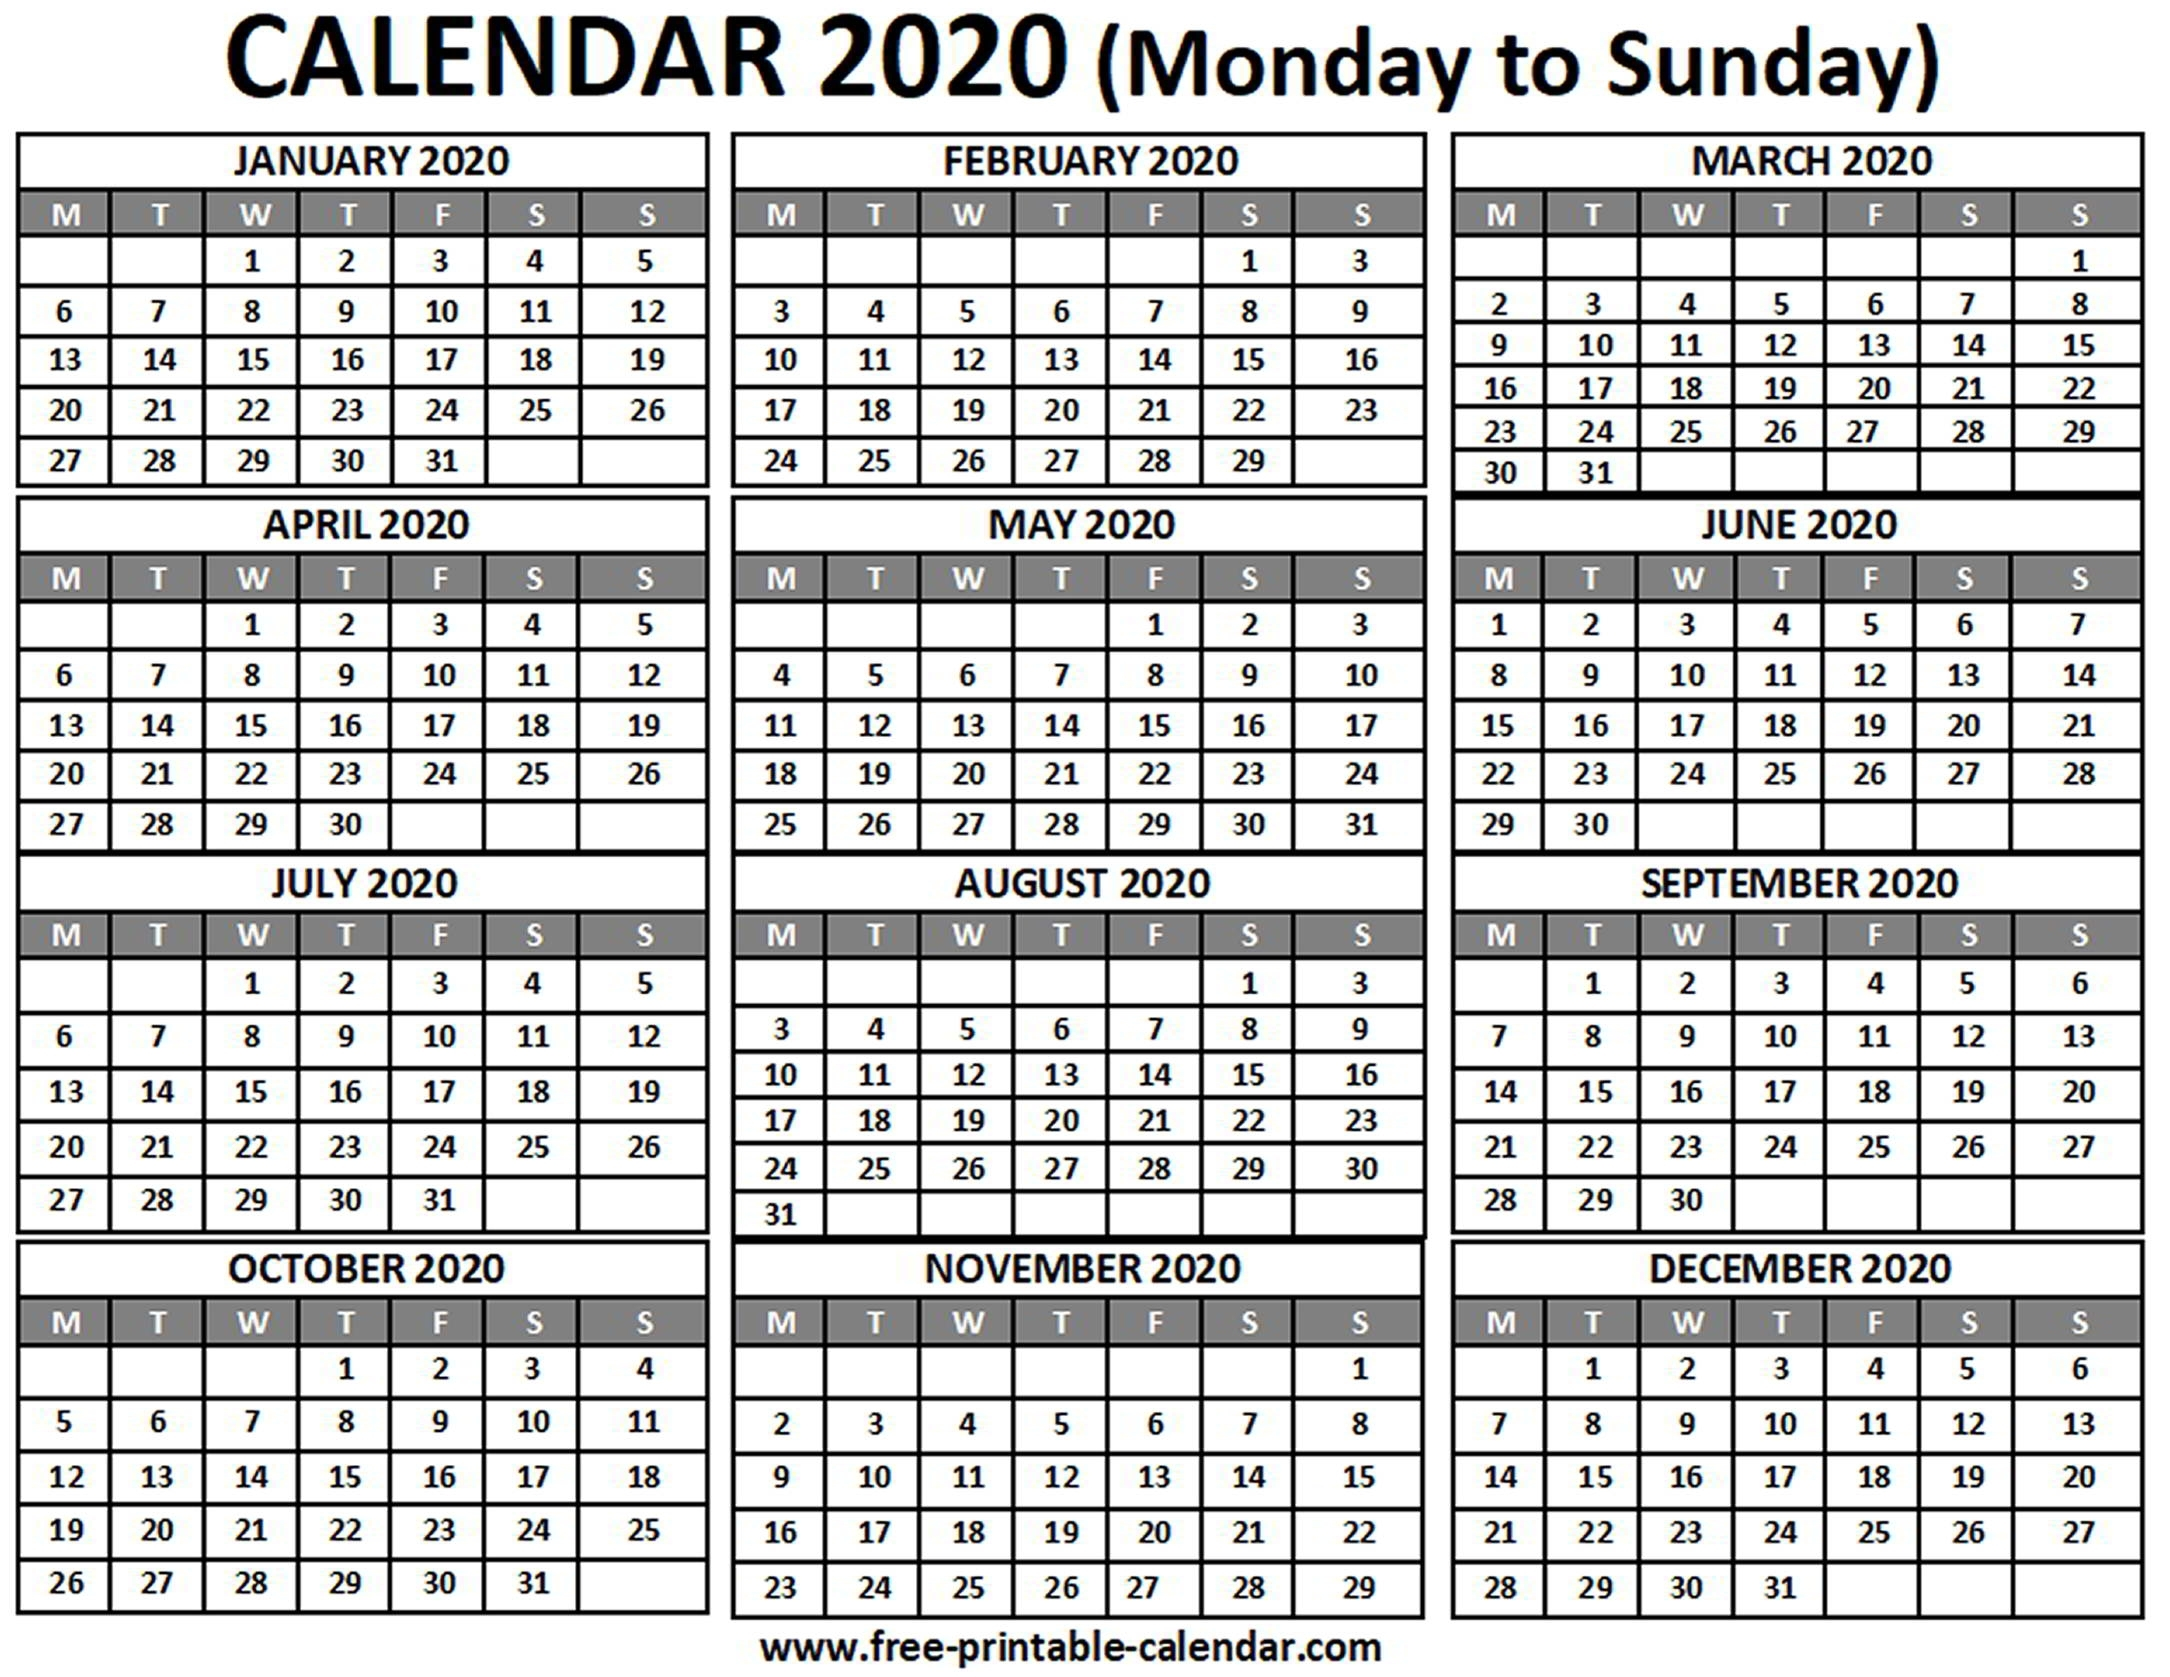 2020 Calendar - Free-Printable-Calendar with regard to Monday To Sunday Calendar 2020 Yearly